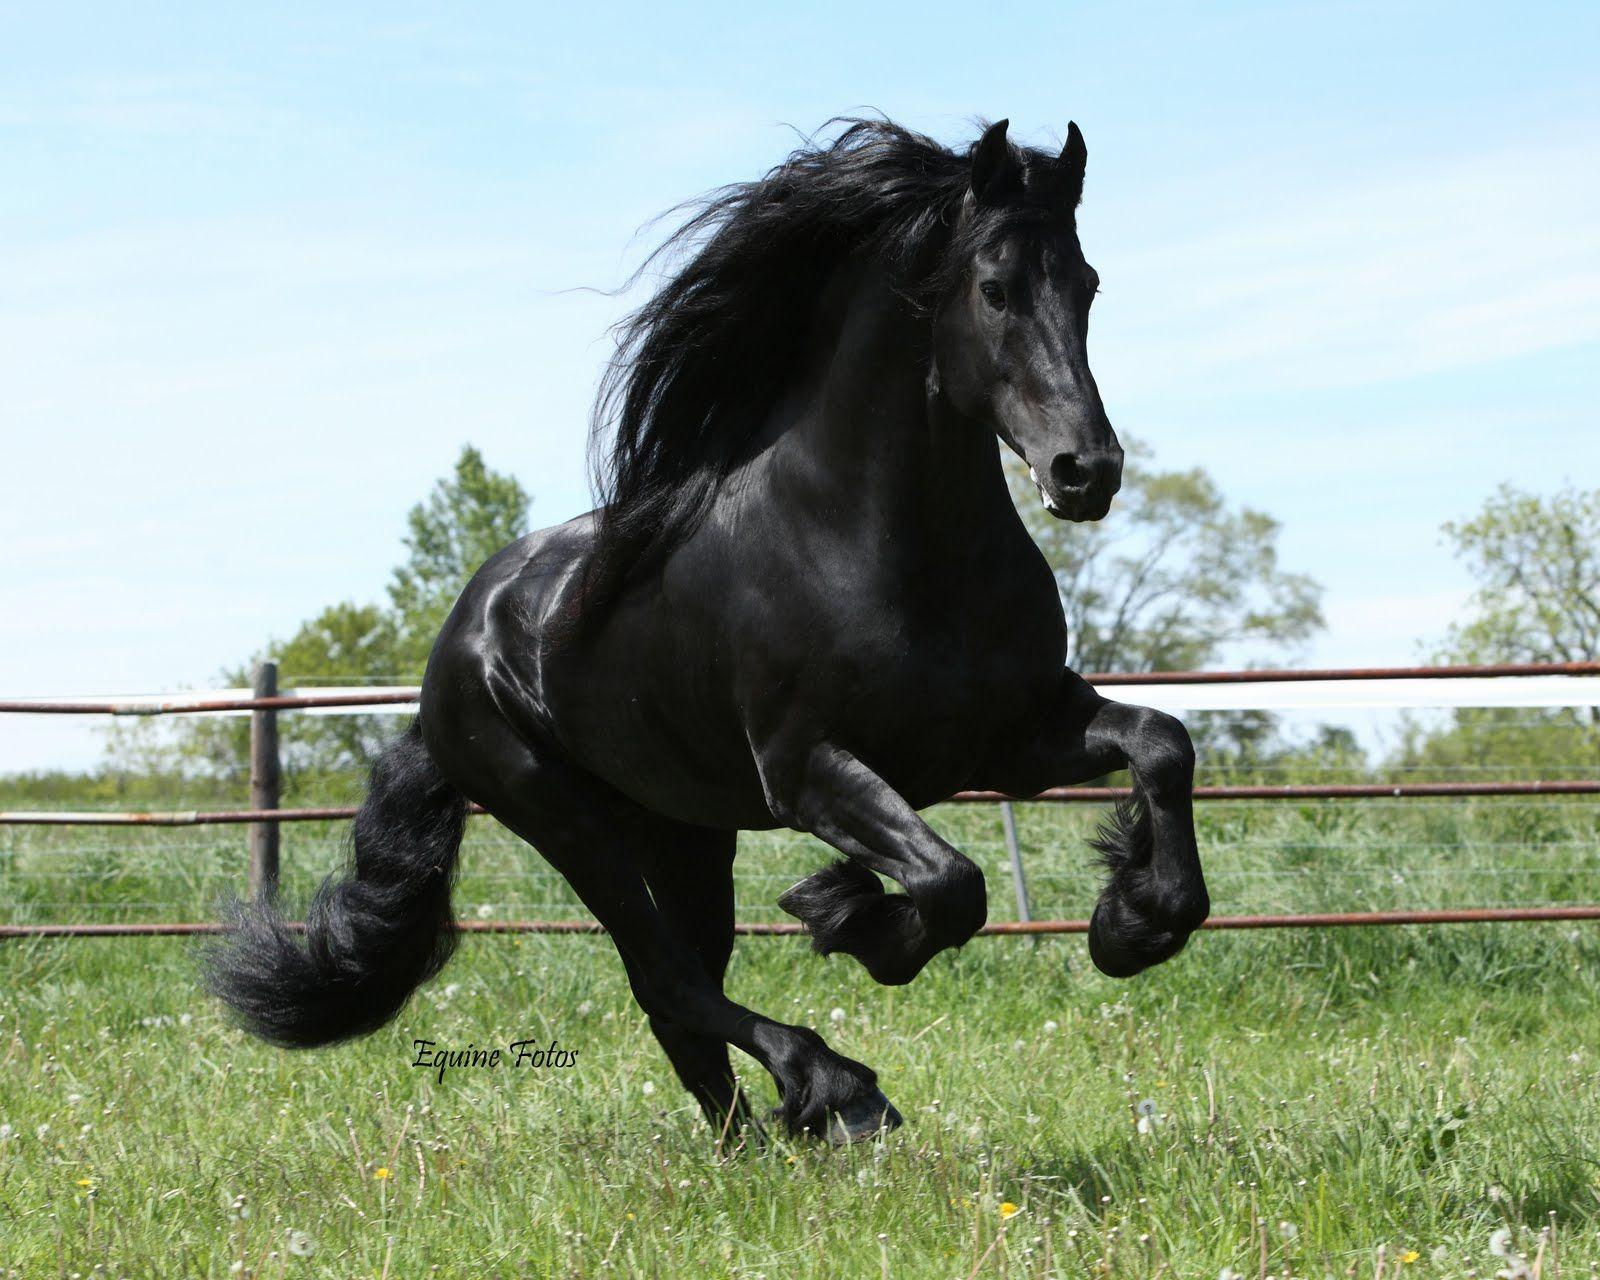 Black Horse Wallpaper Iphone Animal Wallpaper